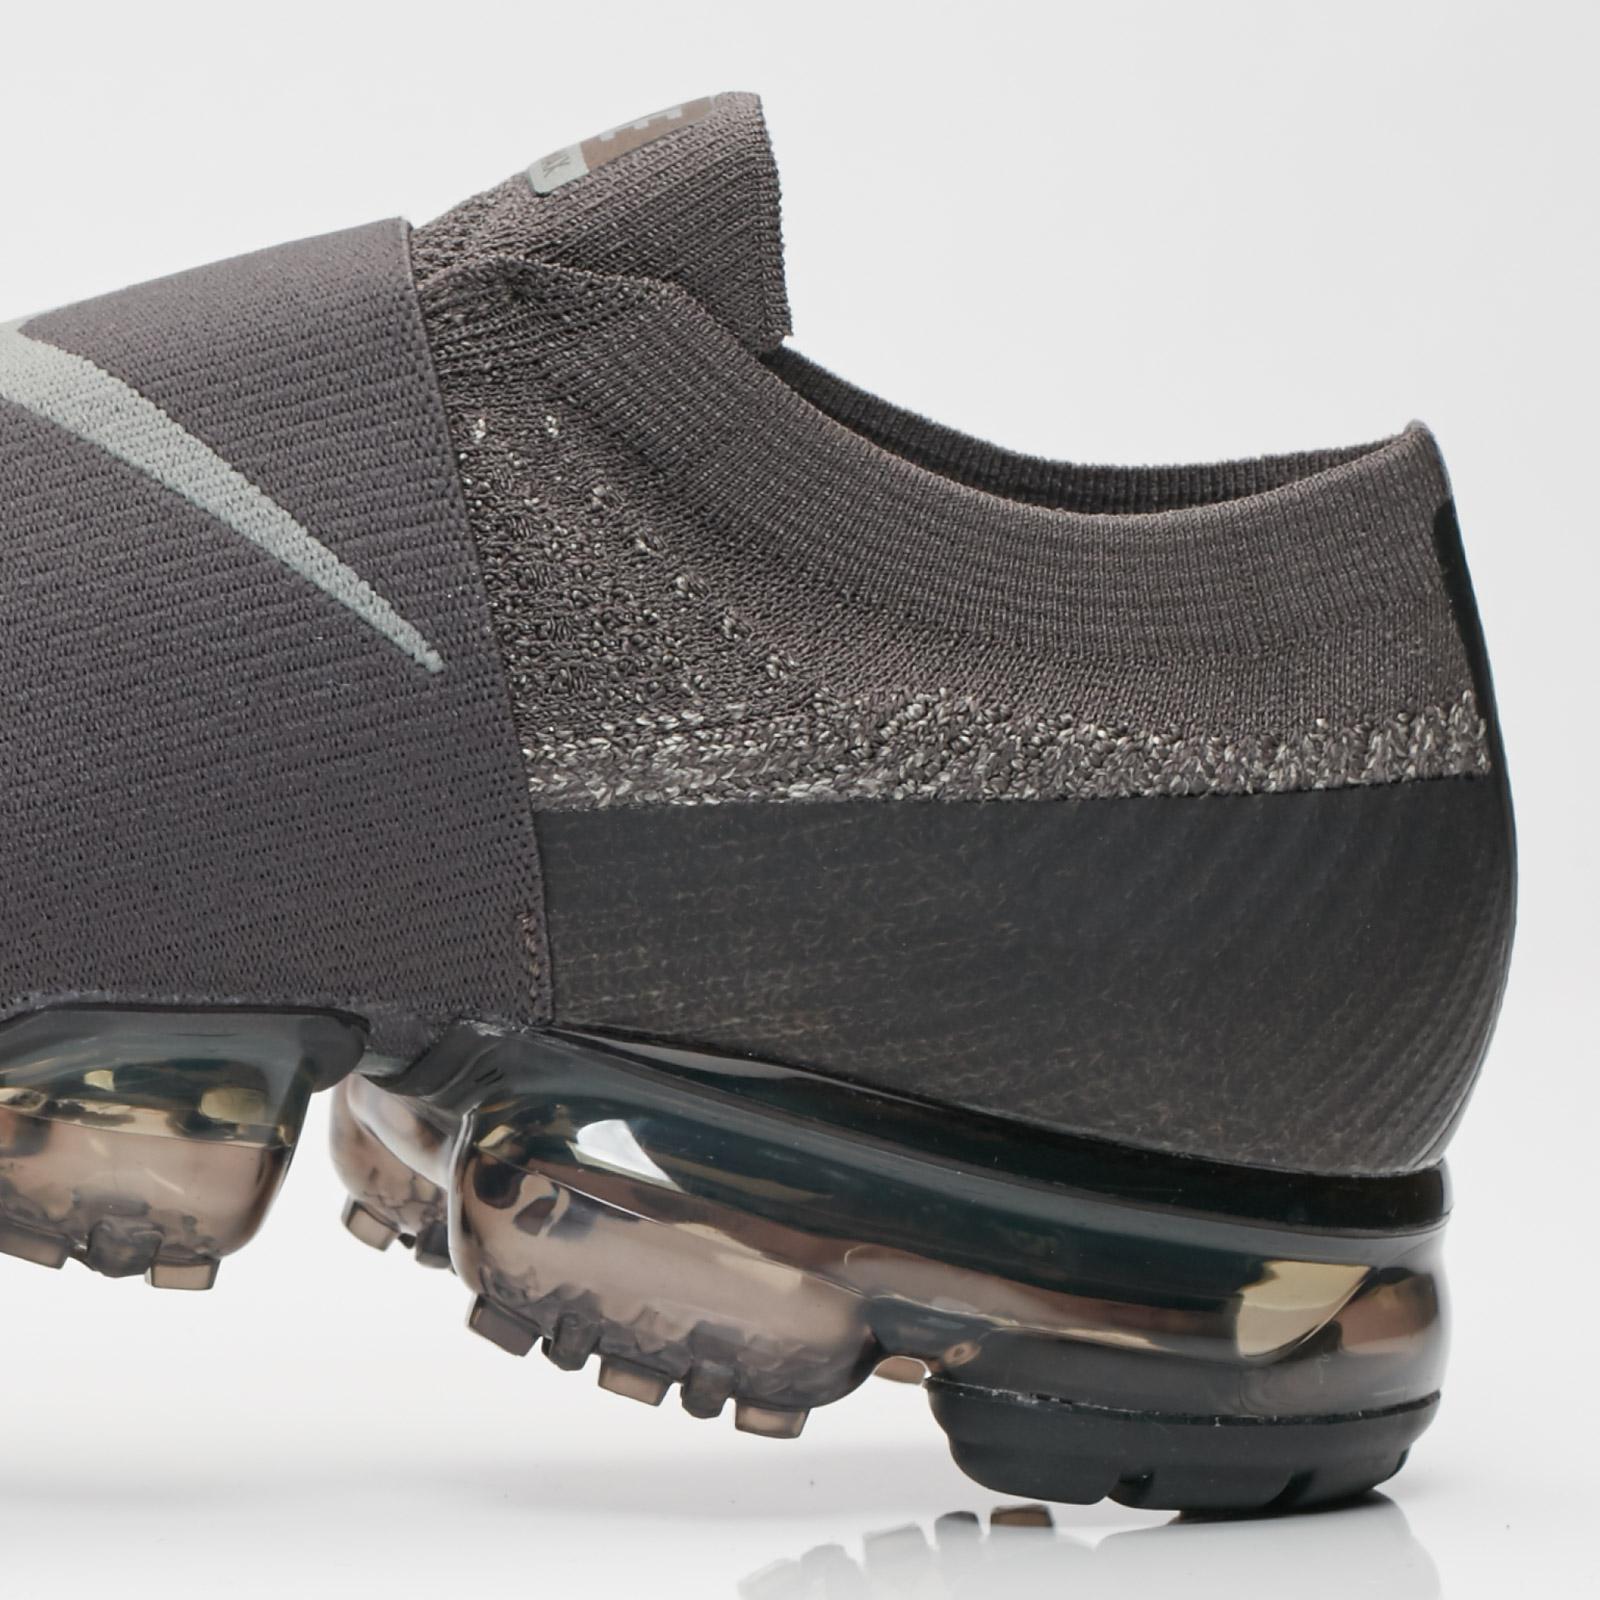 promo code 132d8 86988 Nike Air Vapormax Flyknit Moc - Ah3397-013 - Sneakersnstuff ...